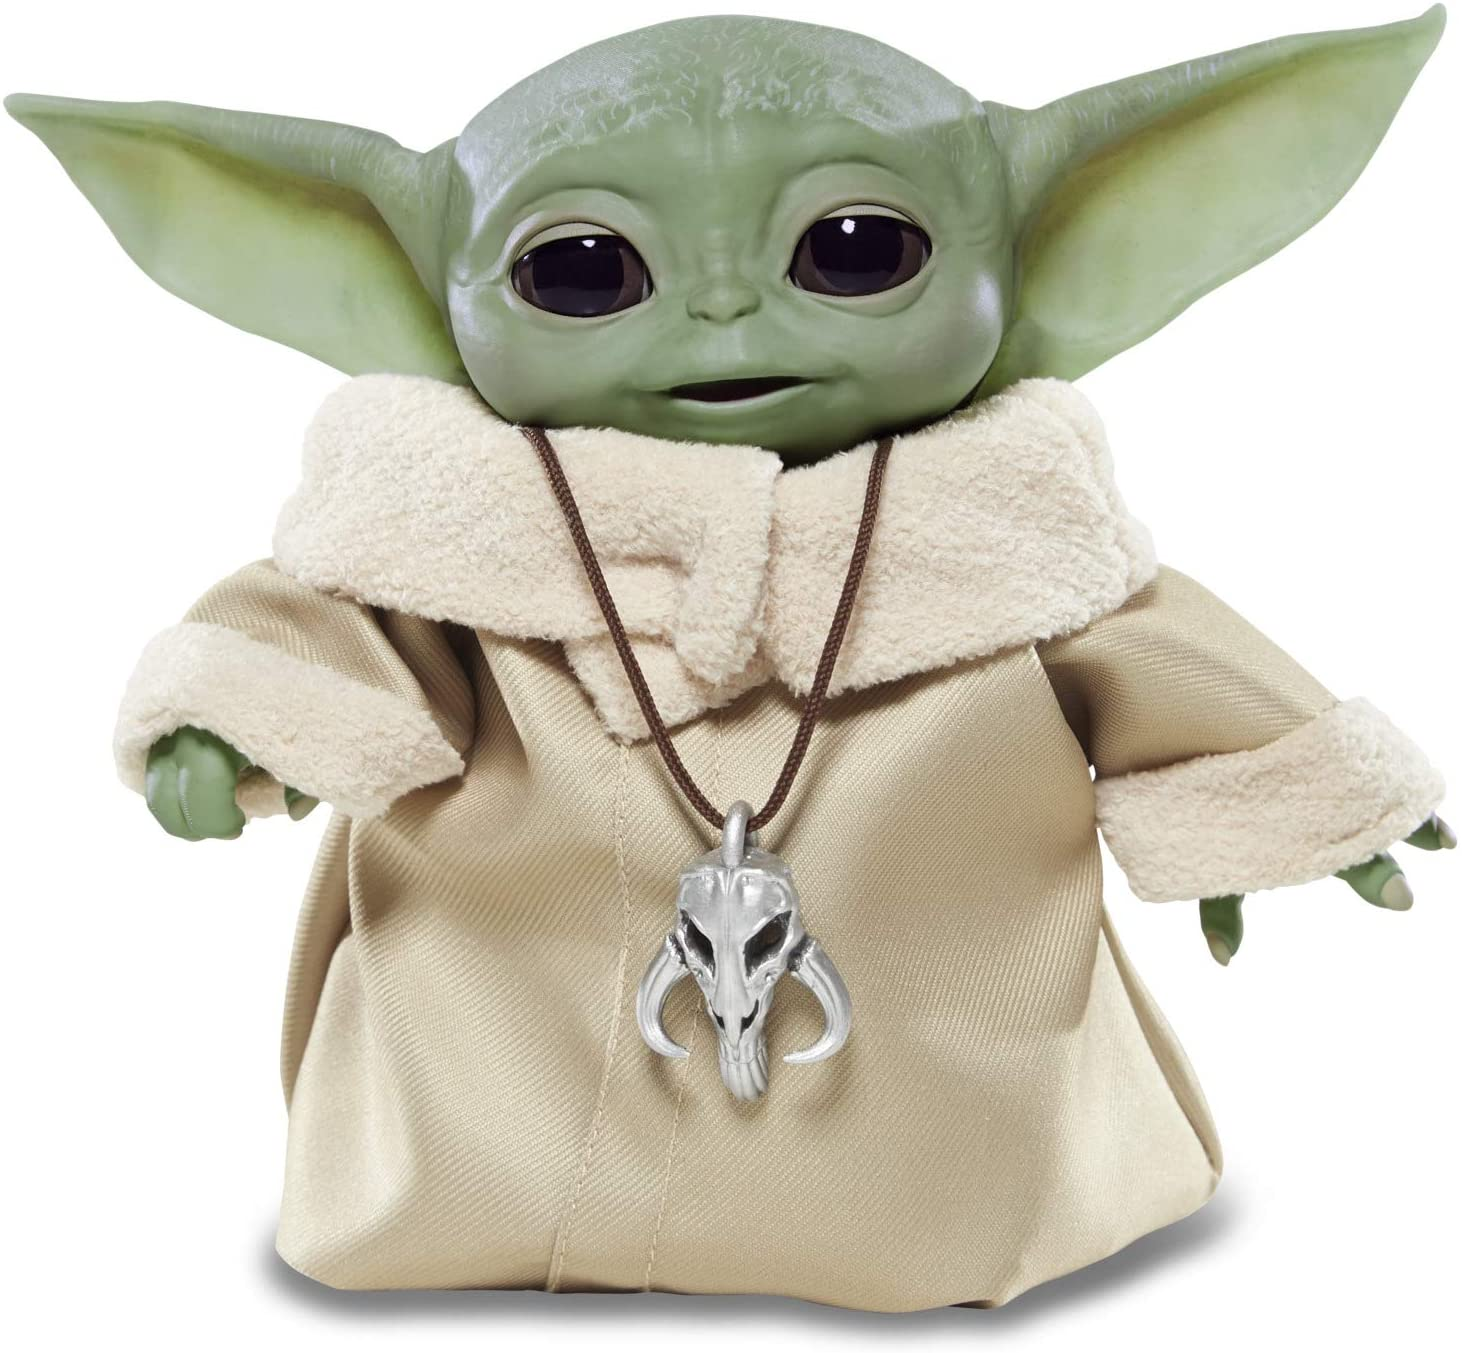 Star Wars The Child Animatronic Edition AKA Baby Yoda